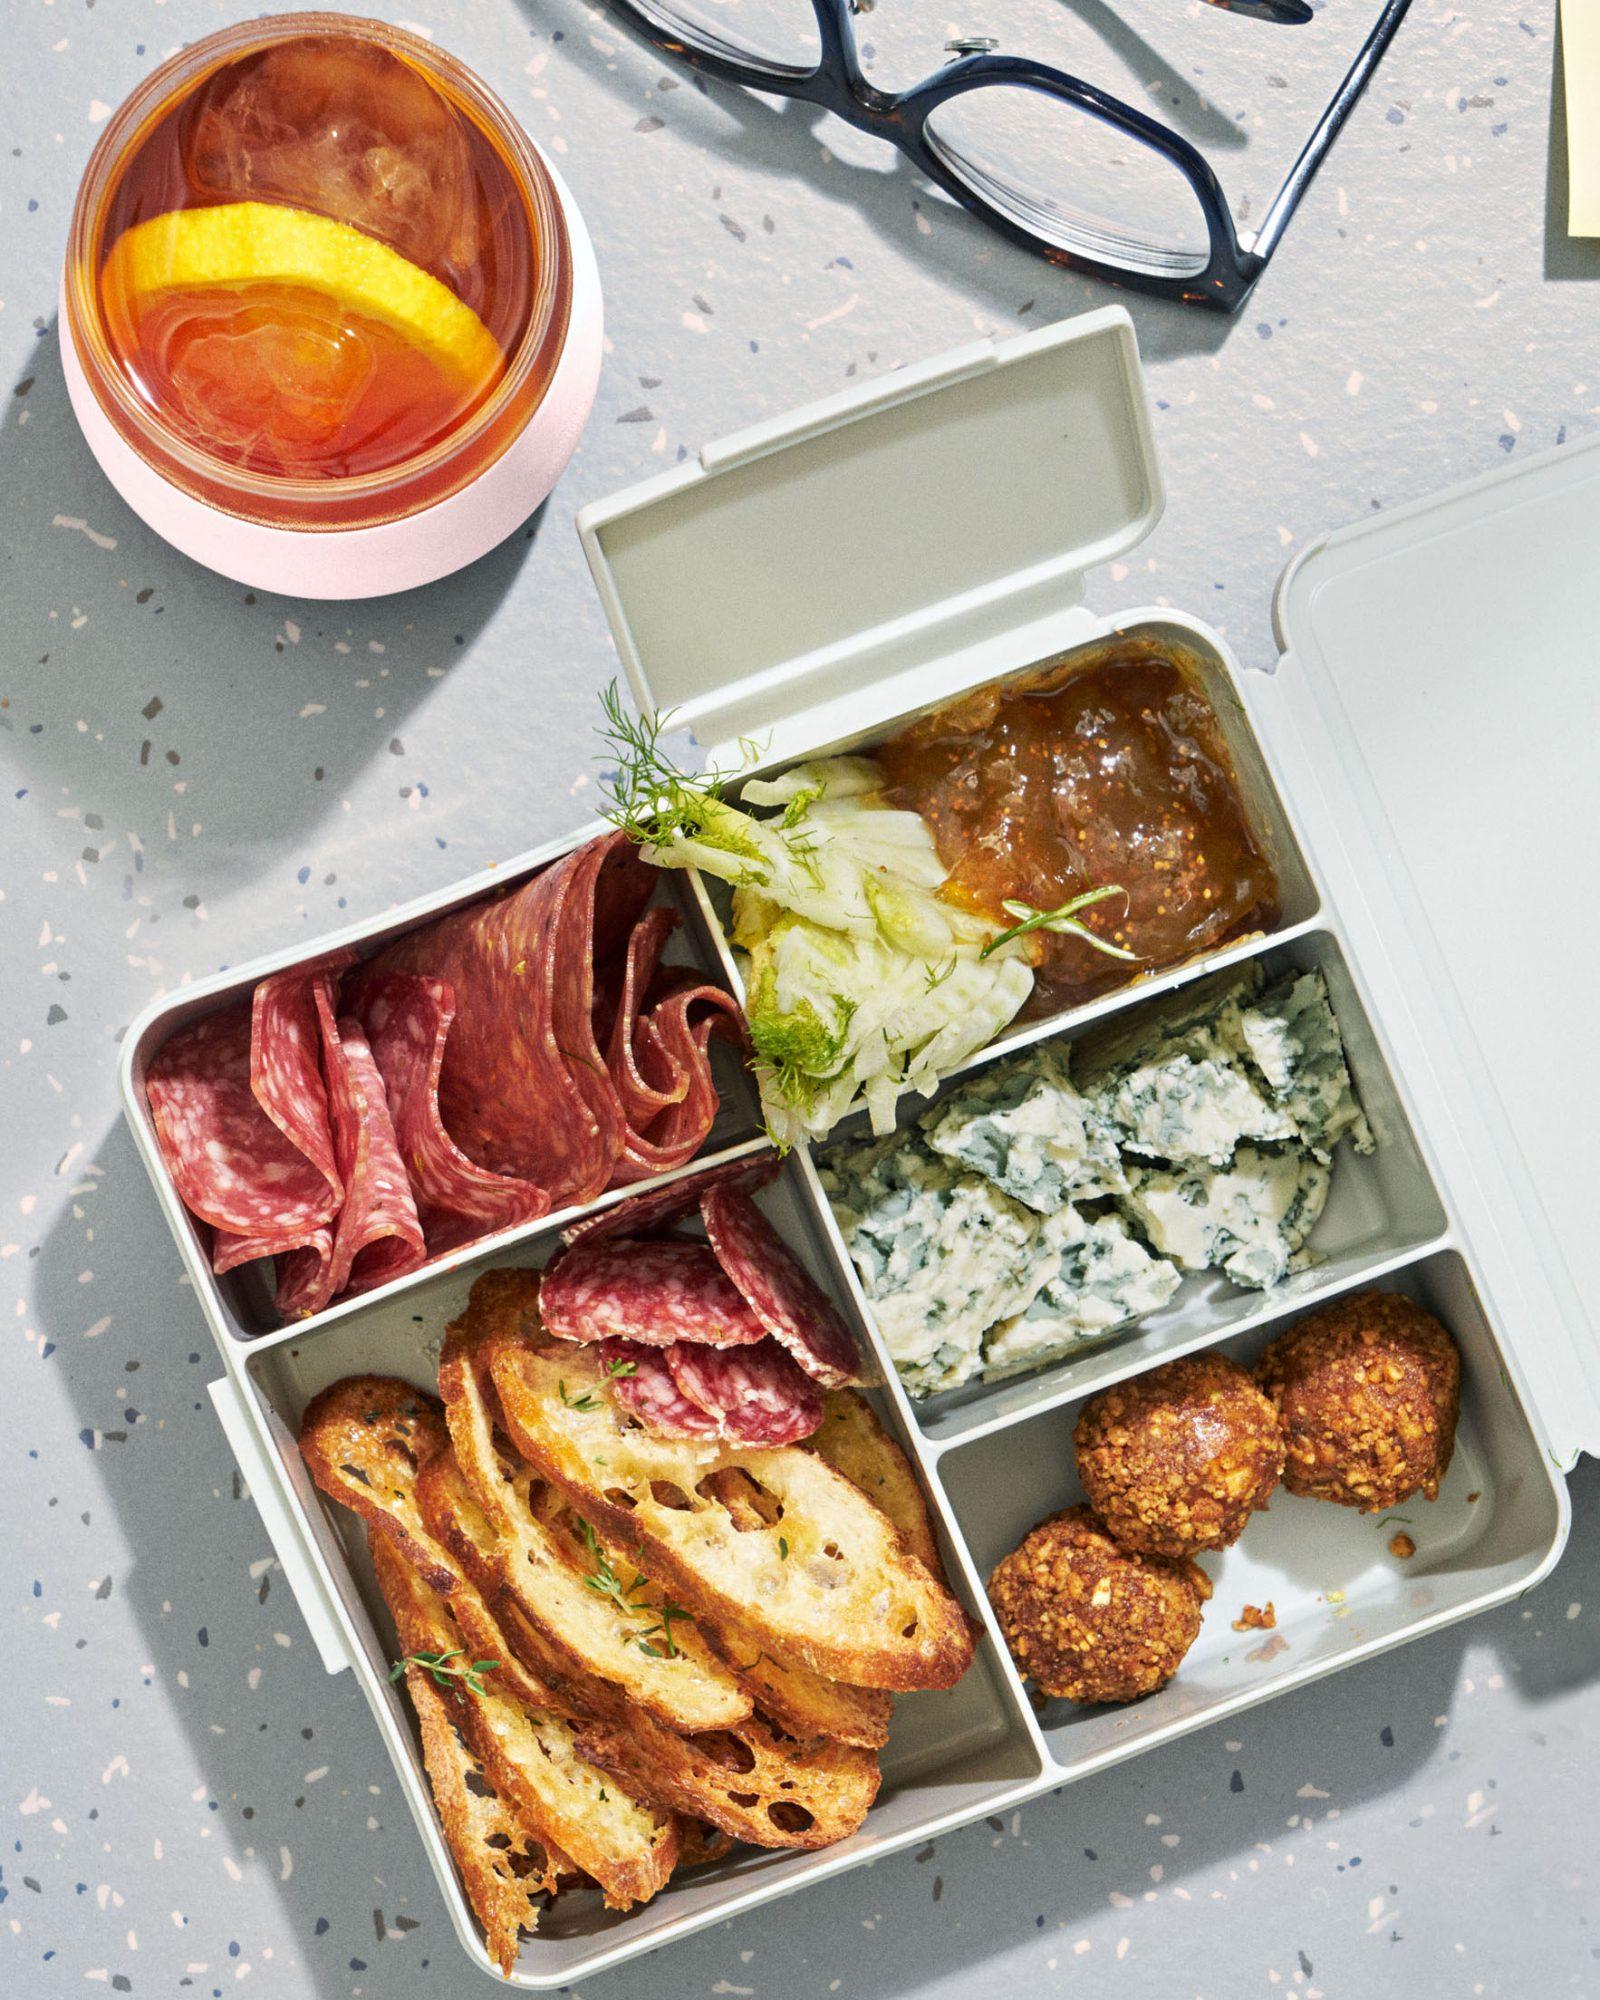 diy desk picnic lunch in bento box and ice tea